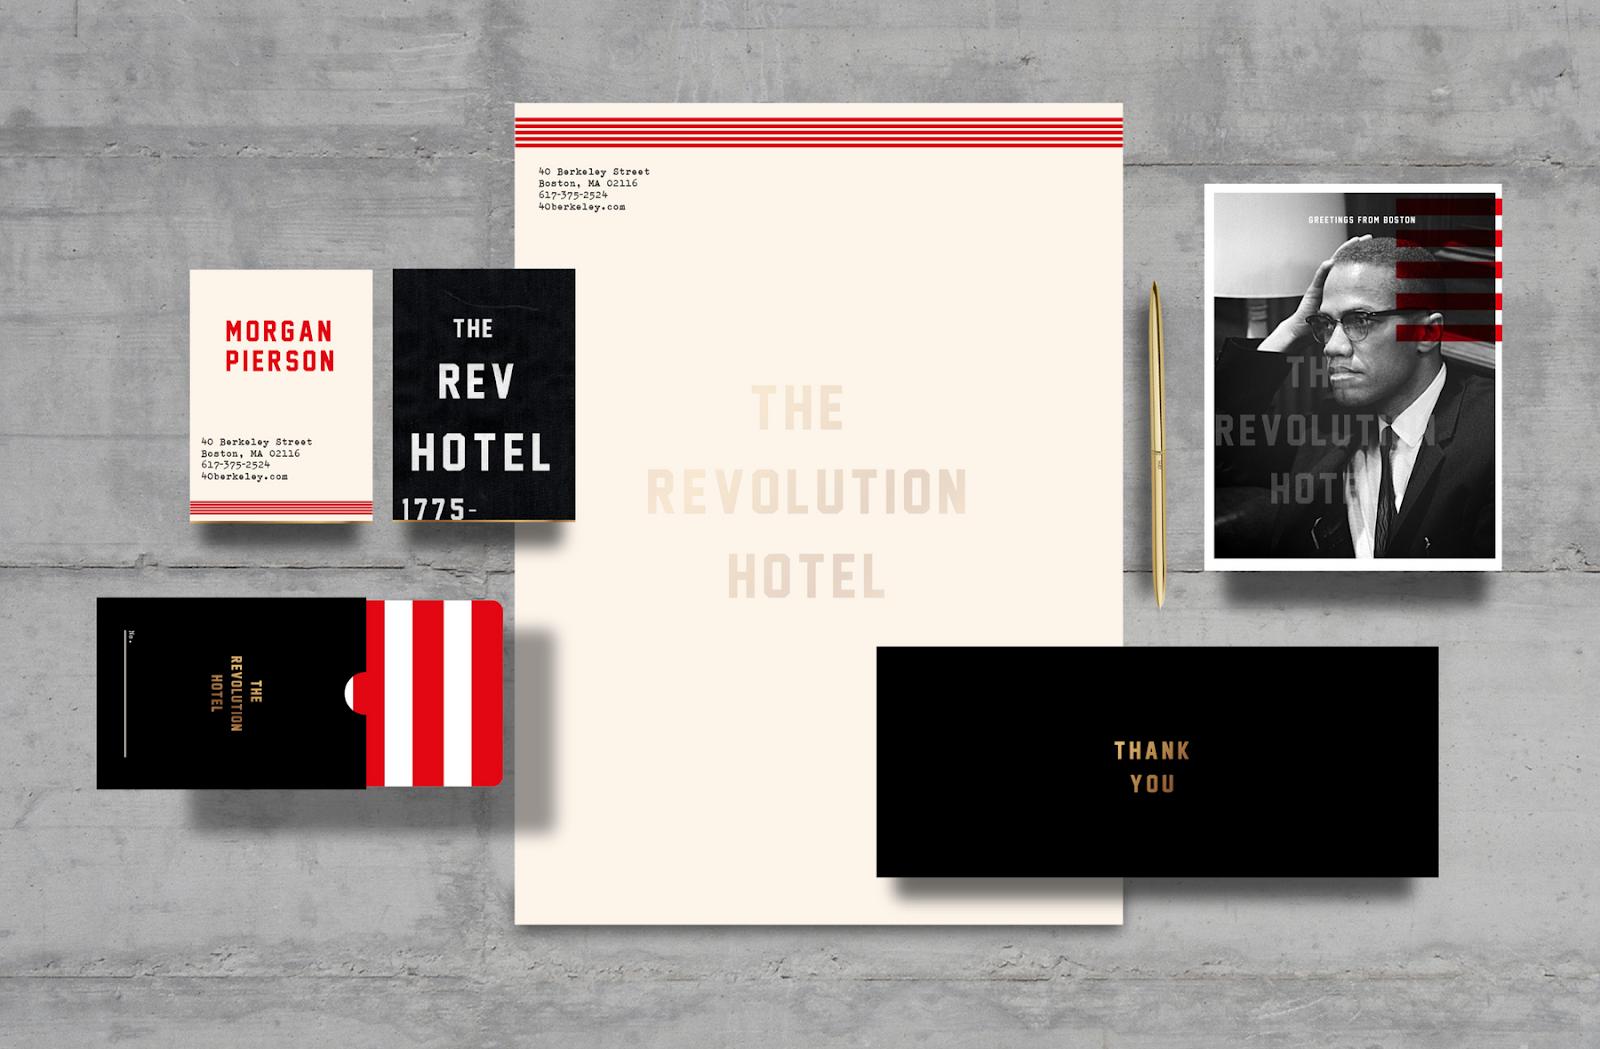 Fully-Immersive Brand Identity for The Revolution Hotel